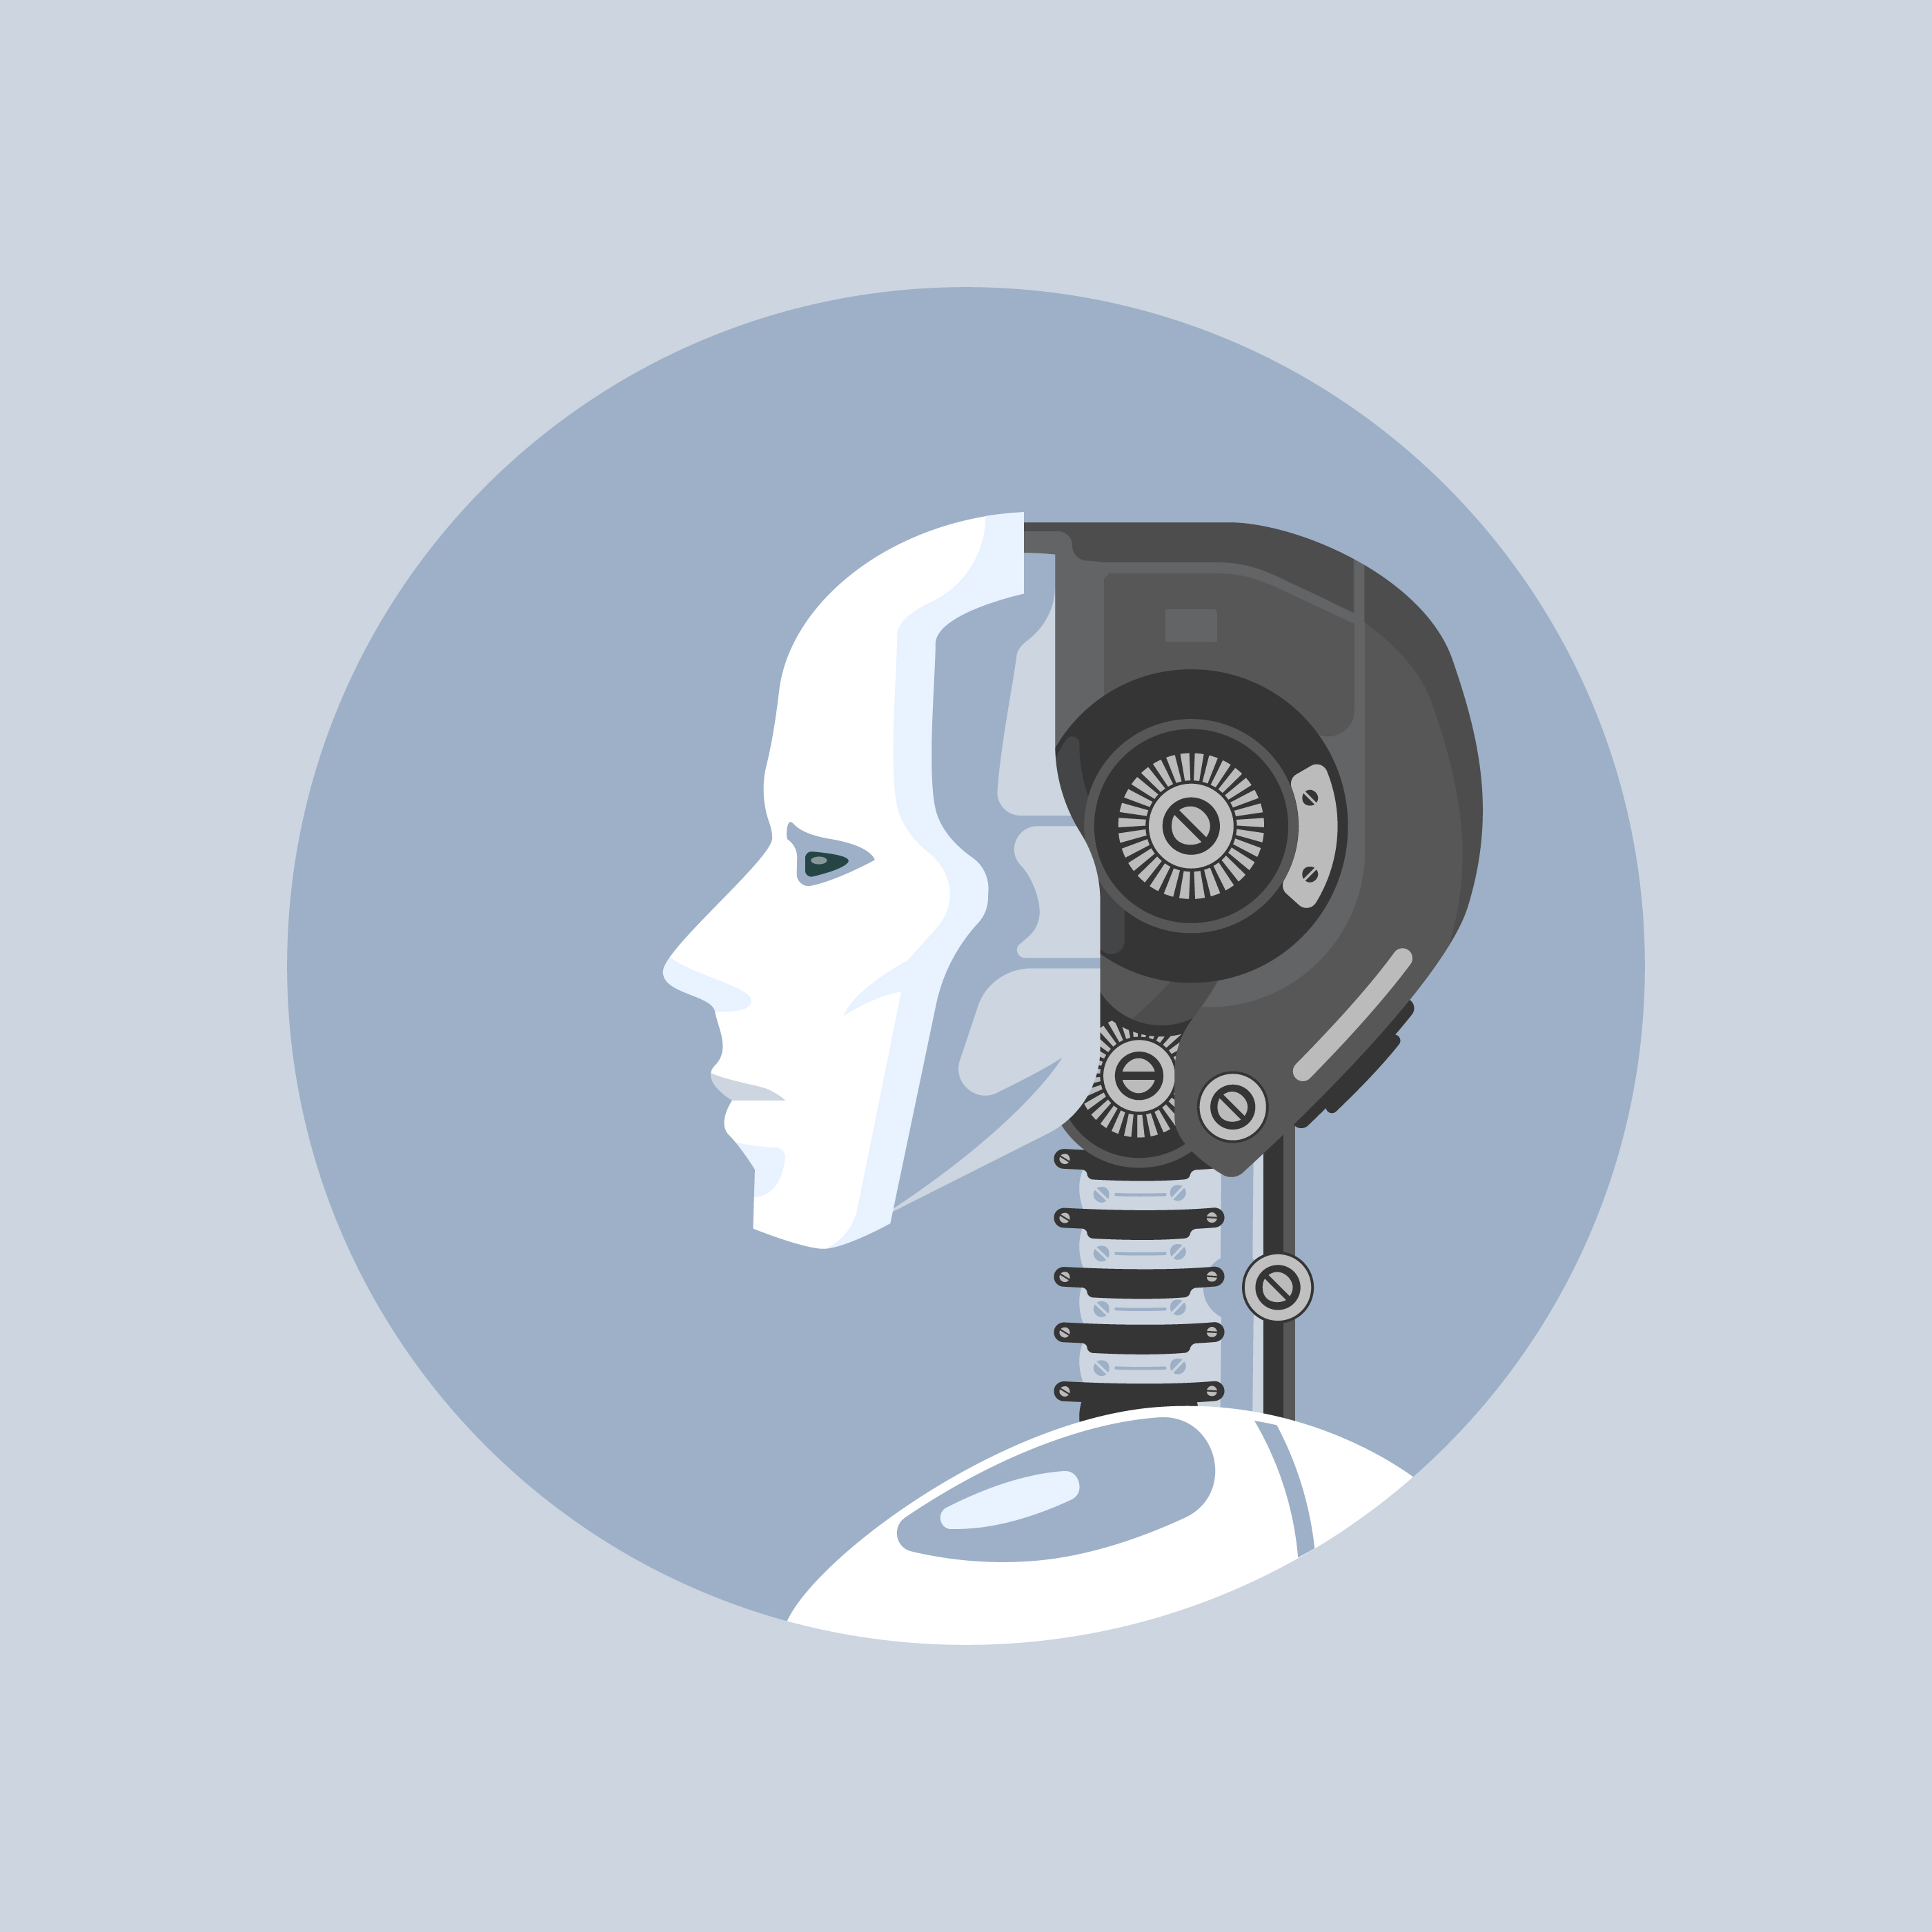 robotics artificial intelligence pdf file download